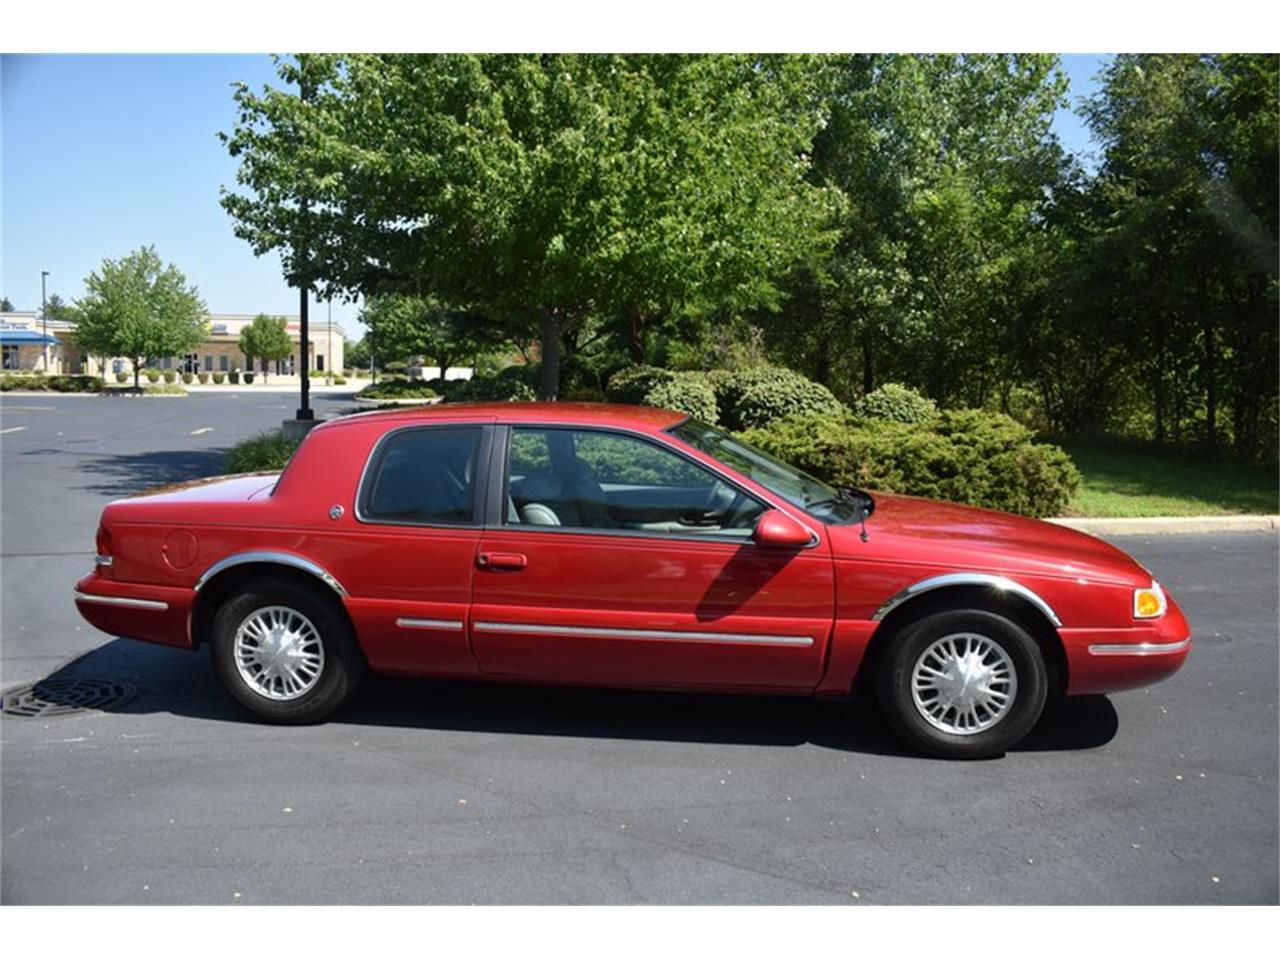 1996 mercury cougar for sale classiccars com cc 1382725 1996 mercury cougar for sale